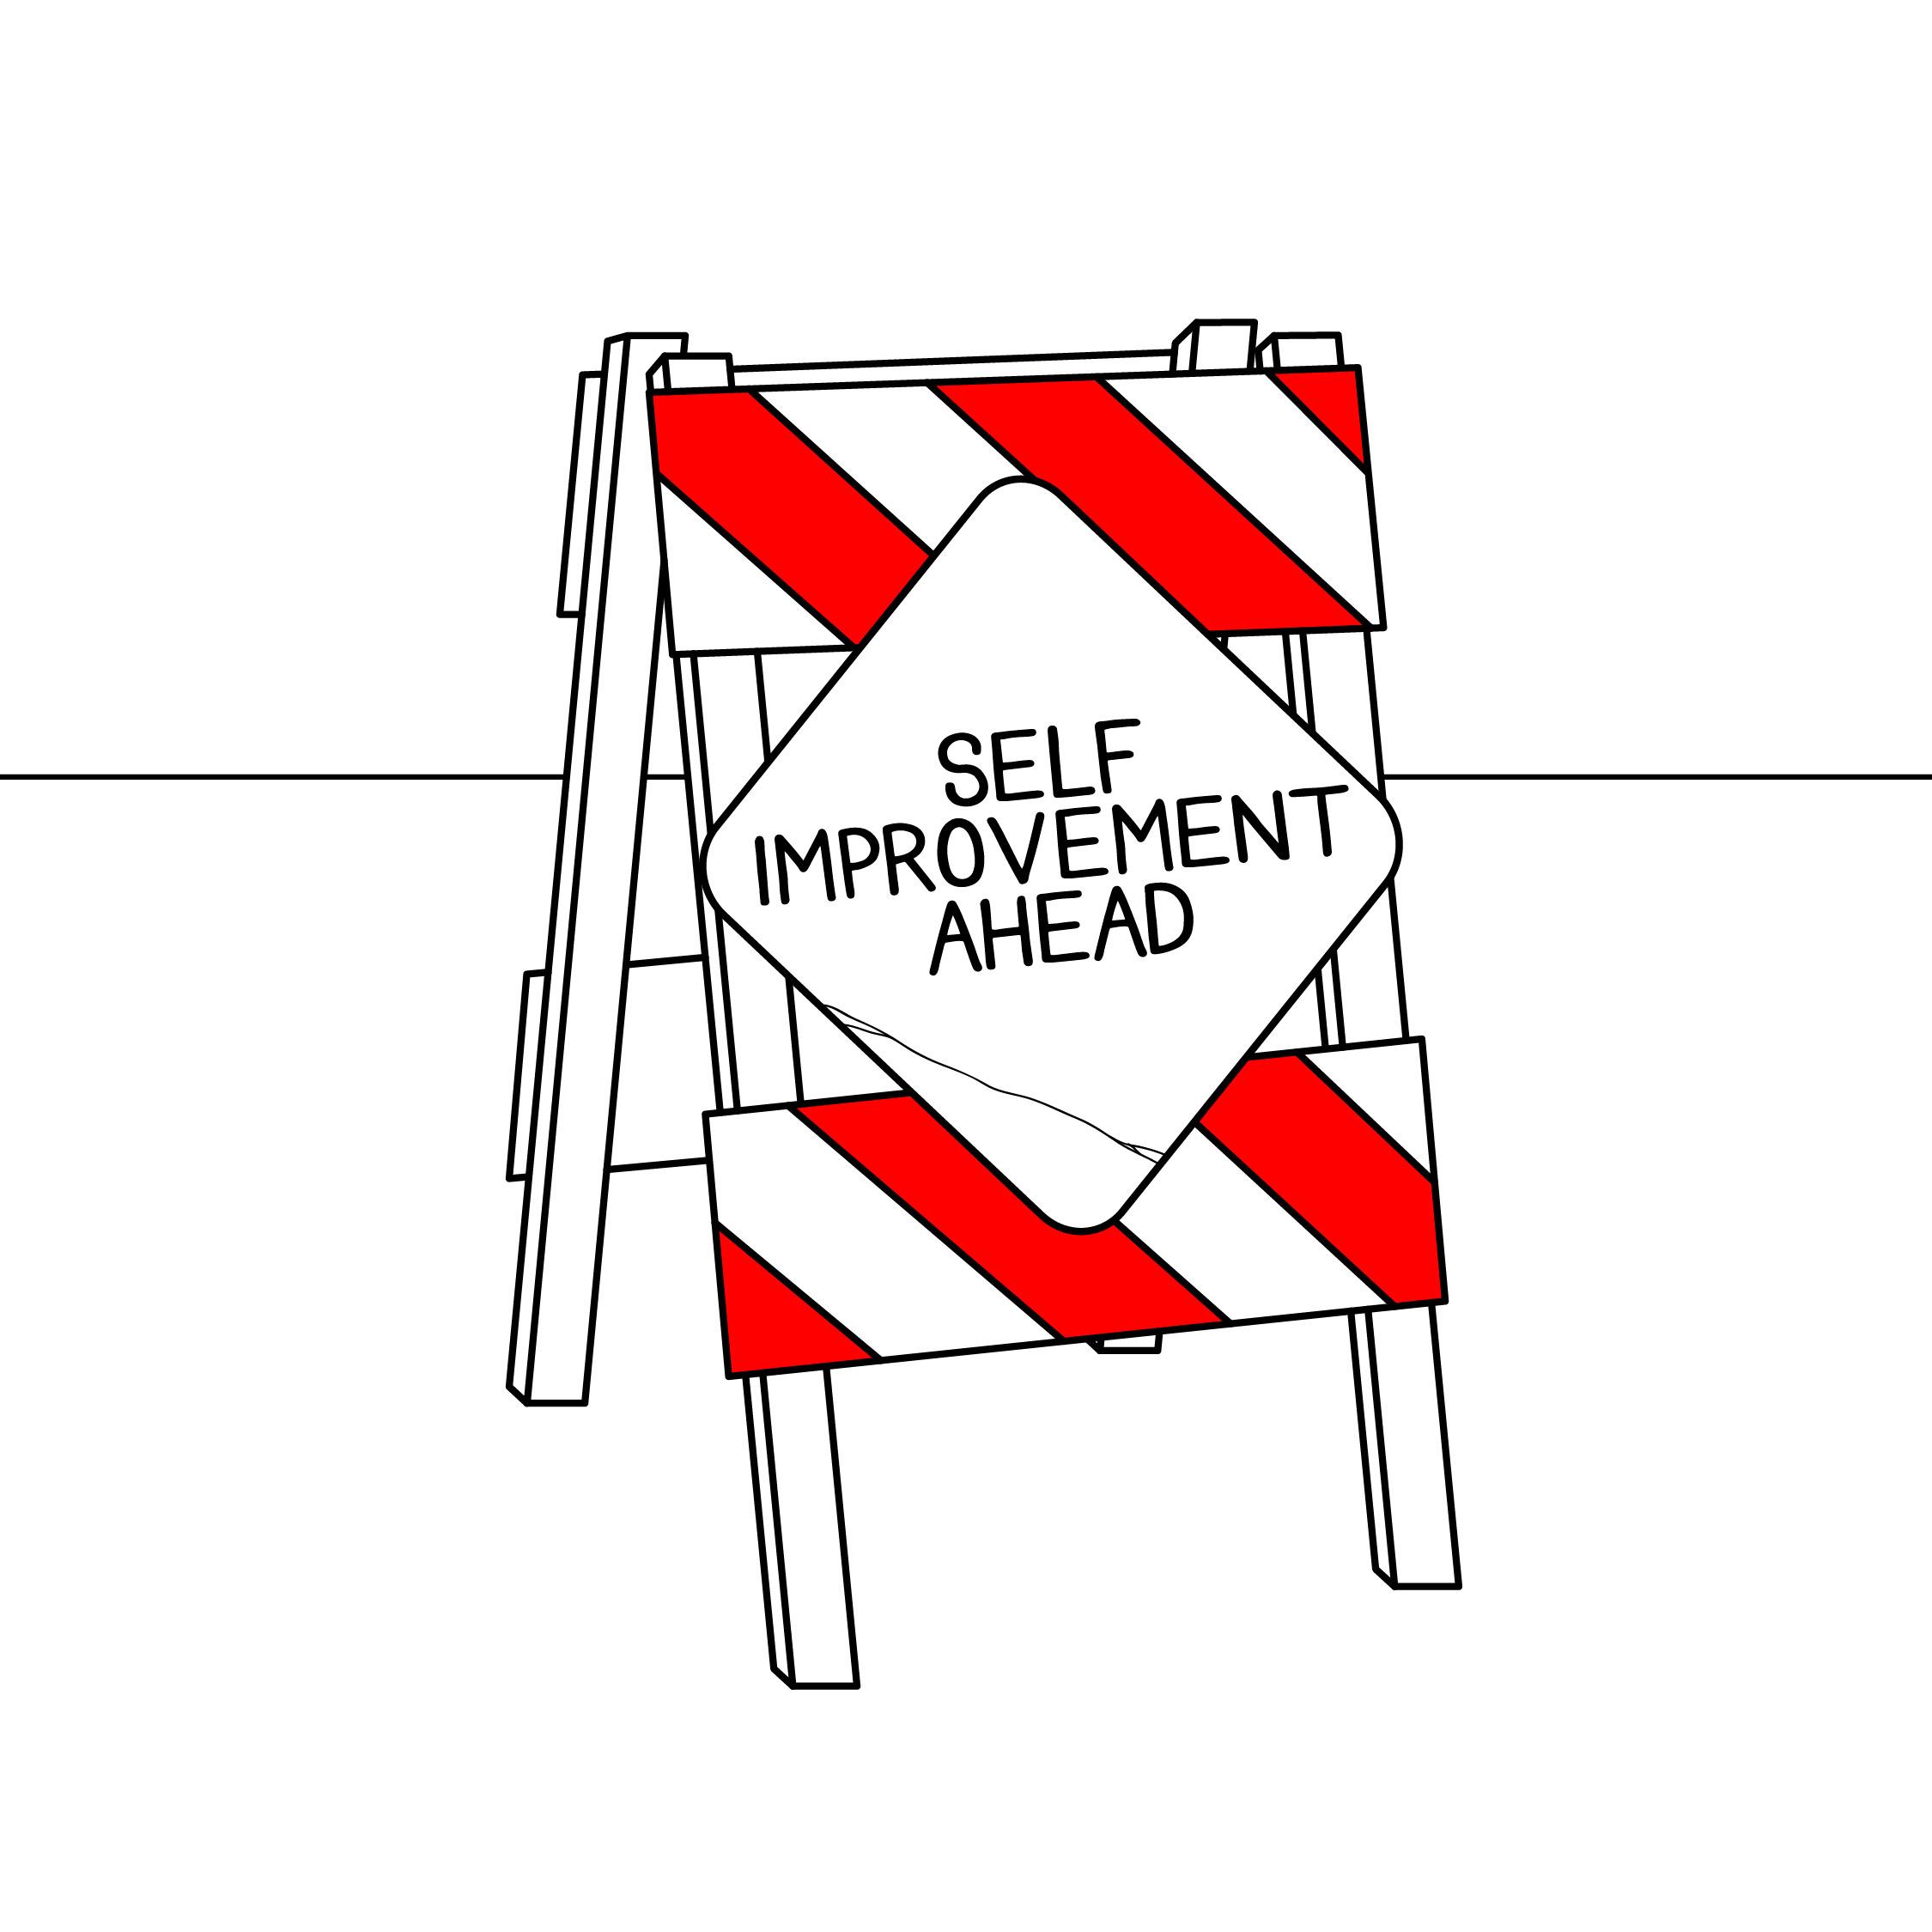 selfimprovement-01.jpg